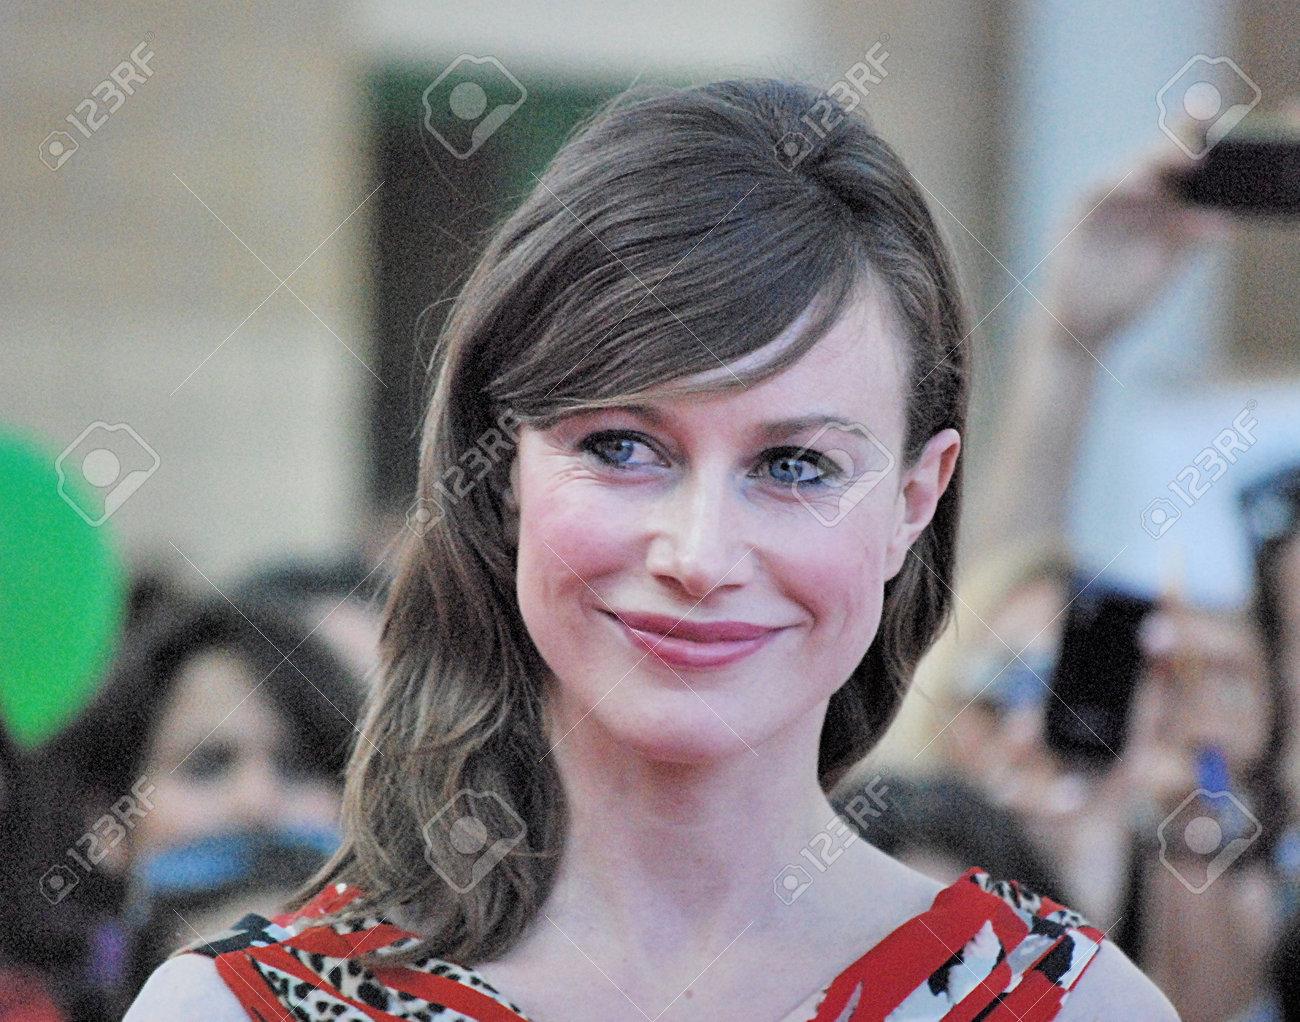 Chloe Norgaard Sex pics & movies Alice Morel-Michaud,Jan Broberg Felt